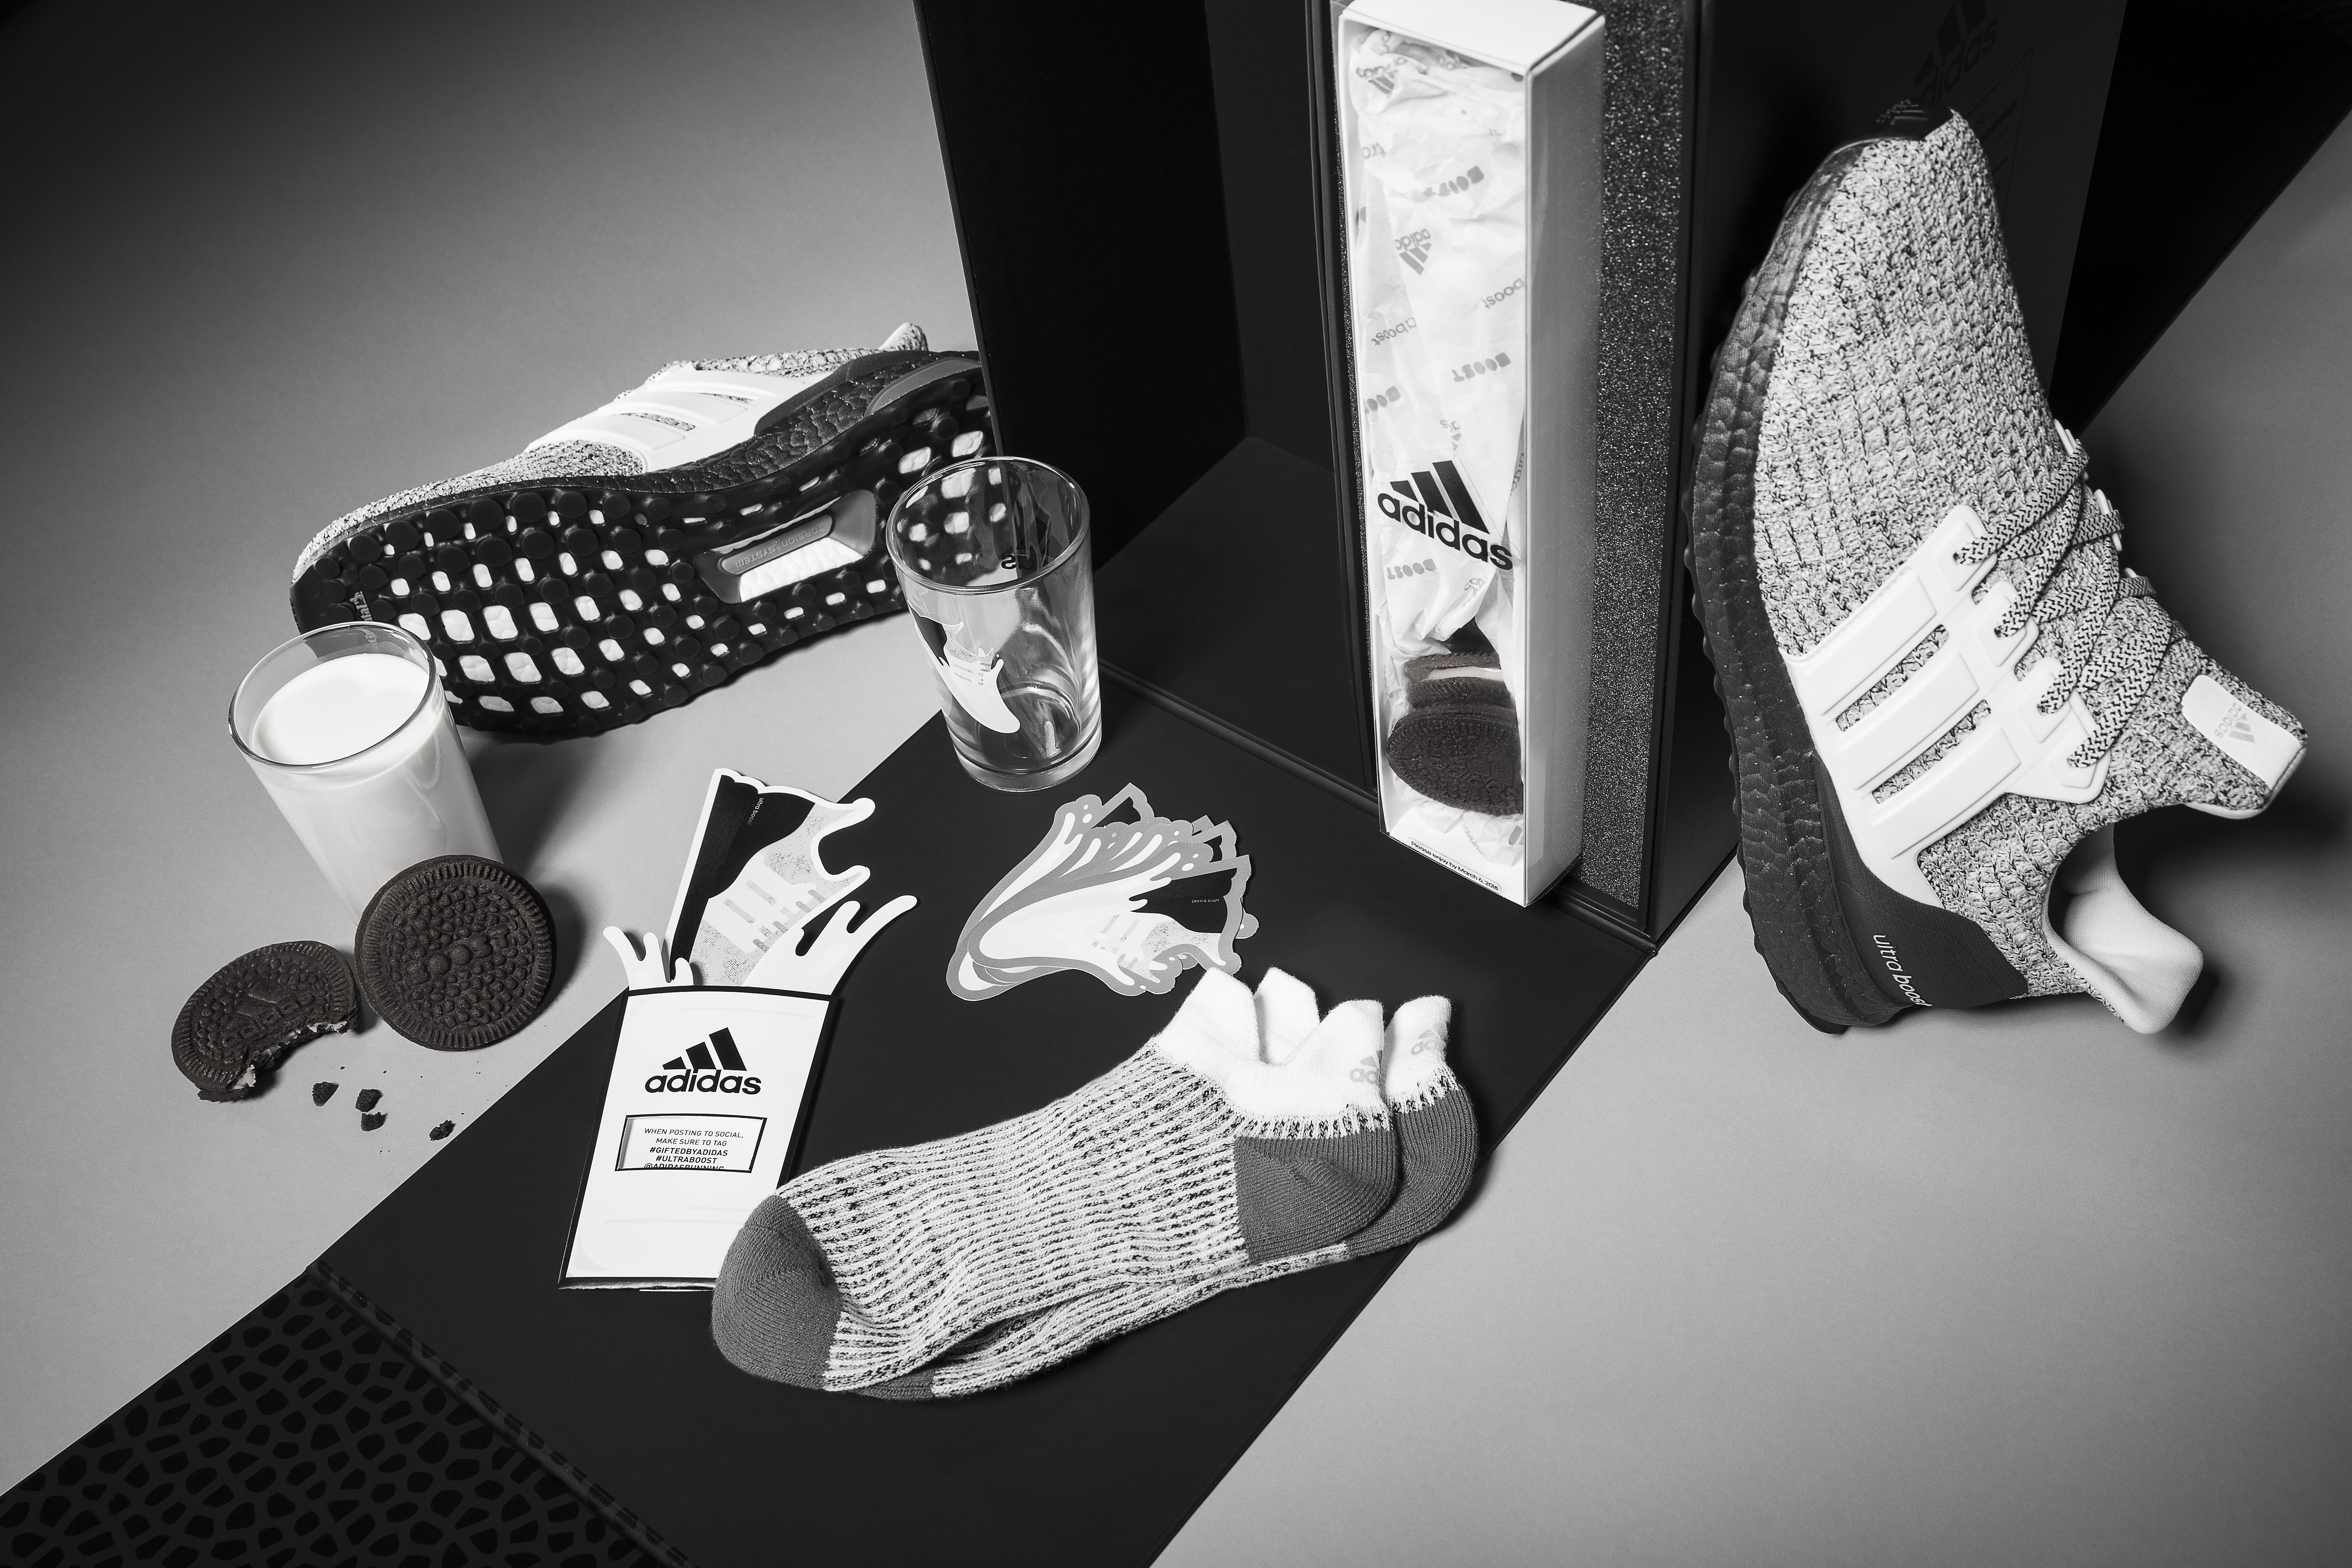 participar de ultramar Centímetro  The adidas Ultra Boost 4.0 LTD Cookies & Cream Drops Next Week •  KicksOnFire.com